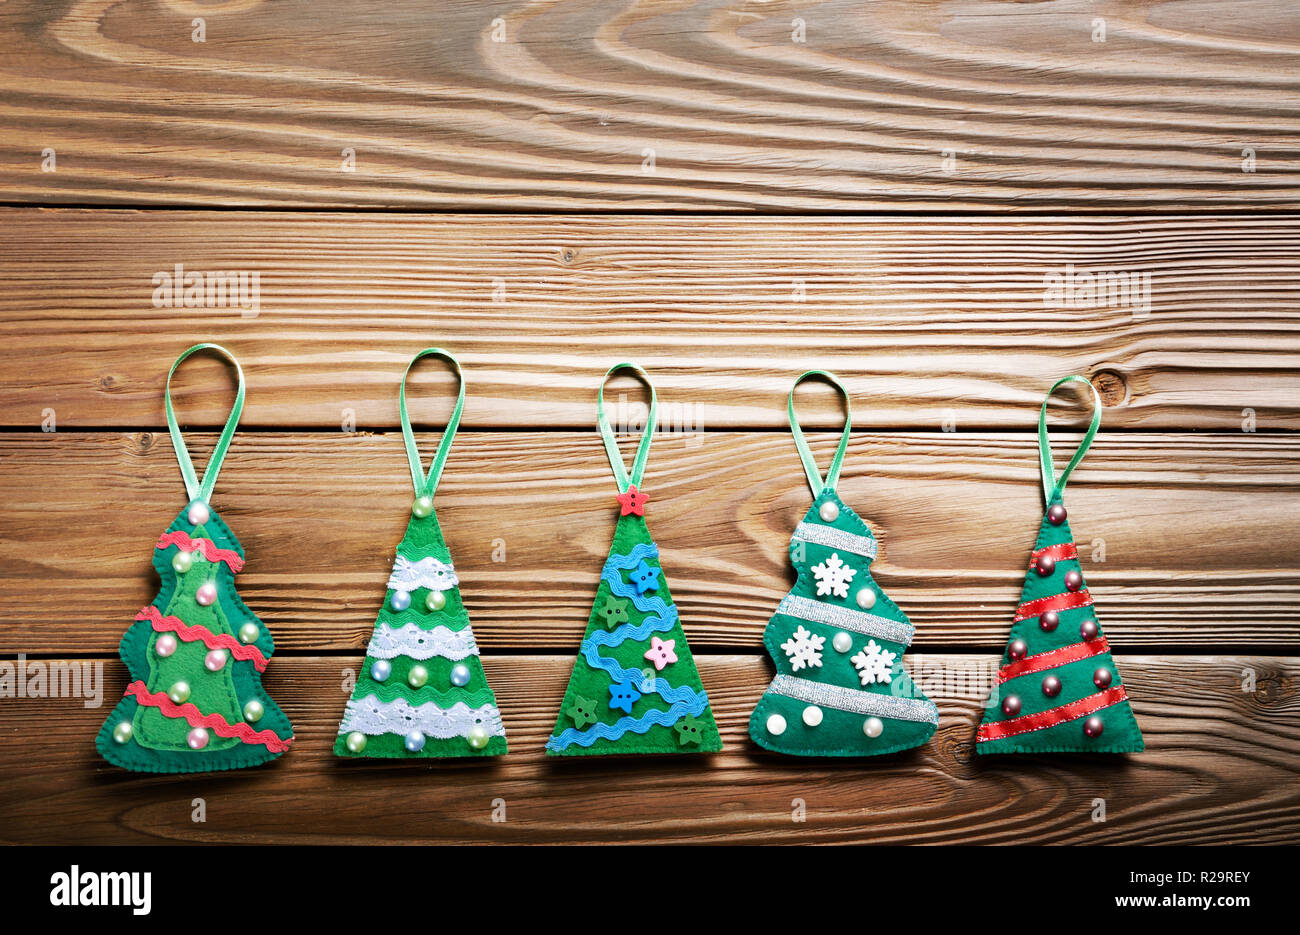 Handmade Rustic Green Felt Christmas Tree Decorations Flat Lying On Wooden Table Stock Photo Alamy